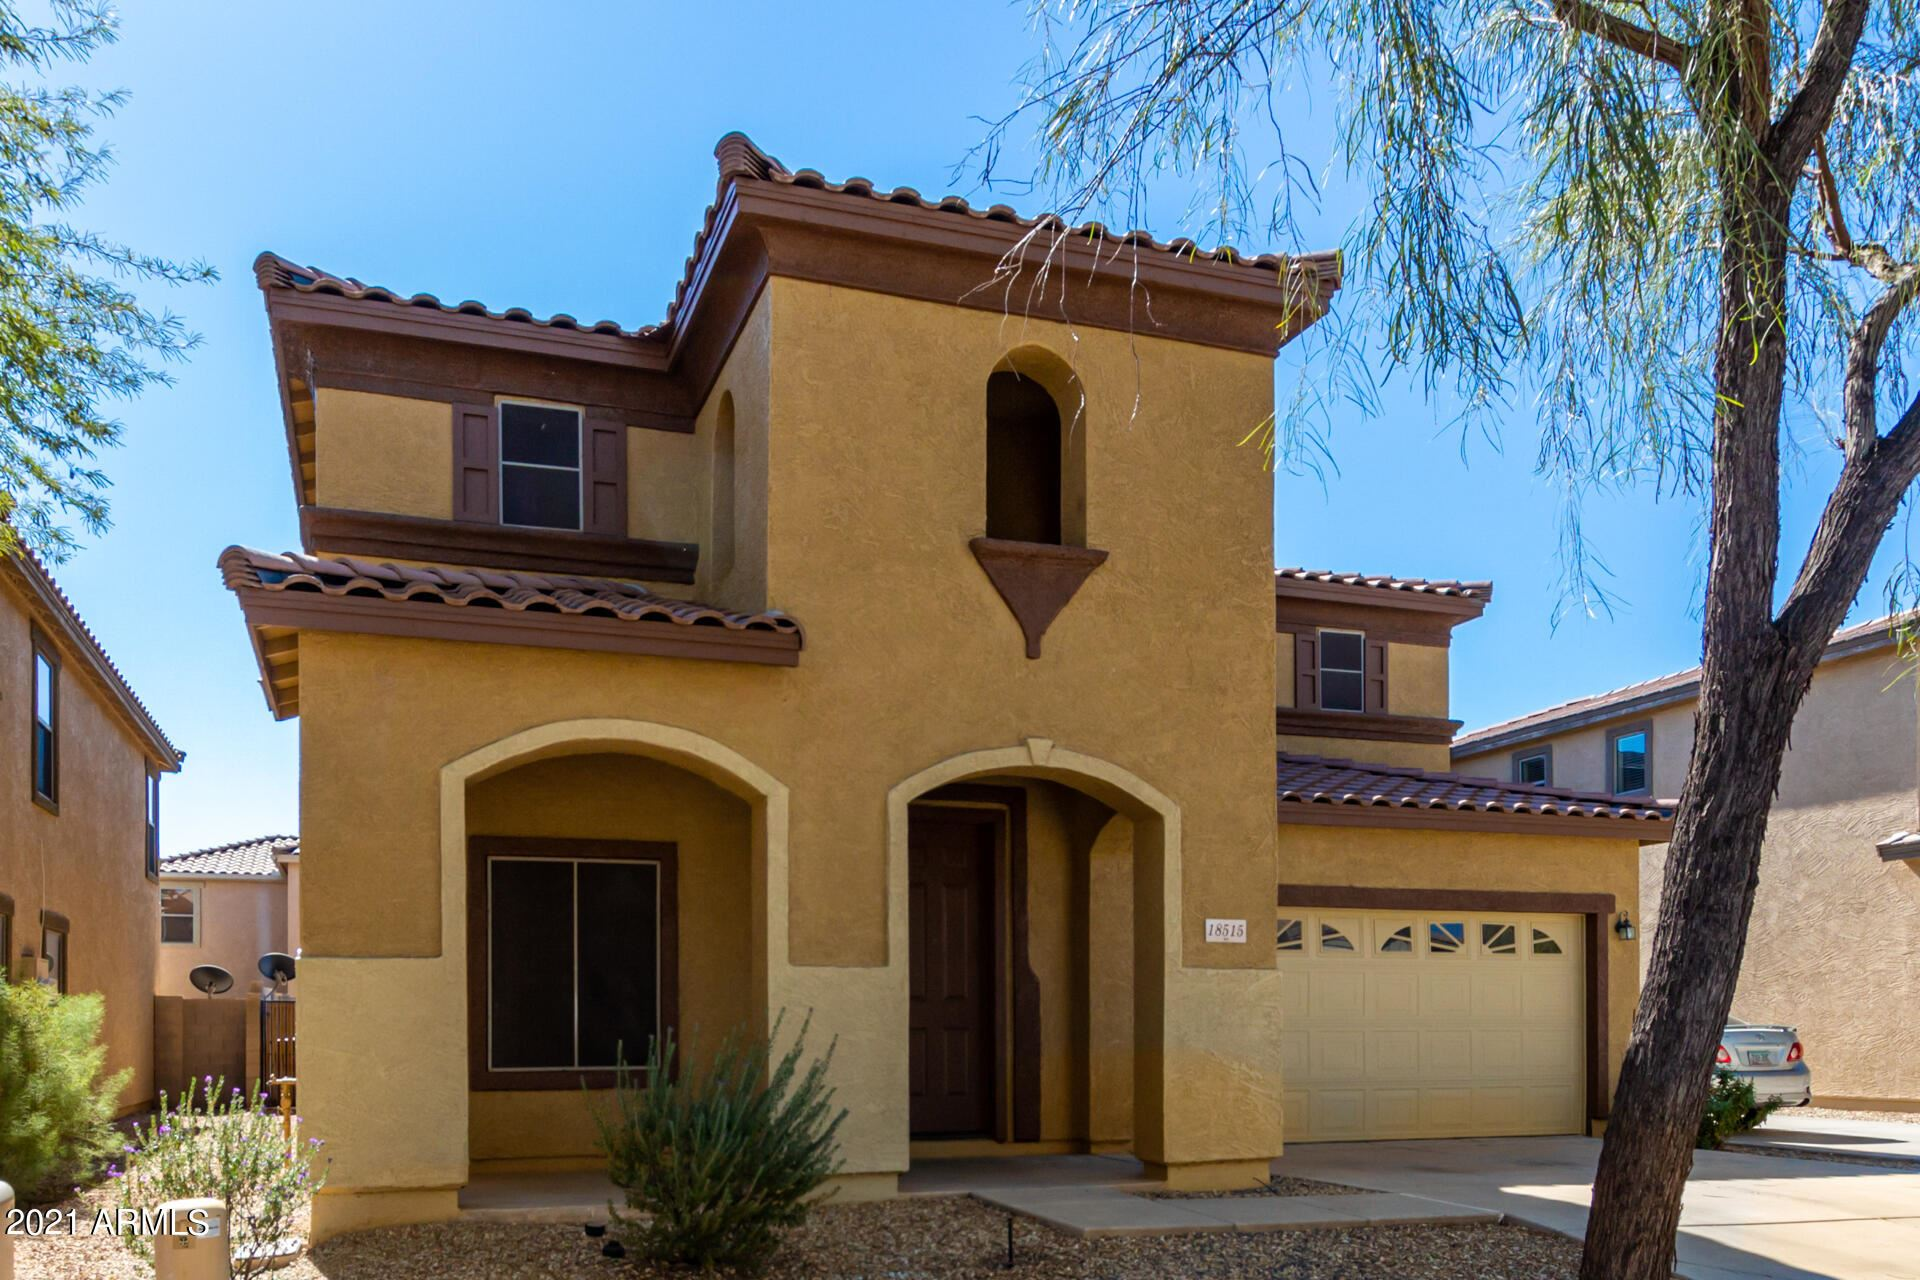 Photo of 18515 W SUNBELT Drive, Surprise, AZ 85374 (MLS # 6309655)